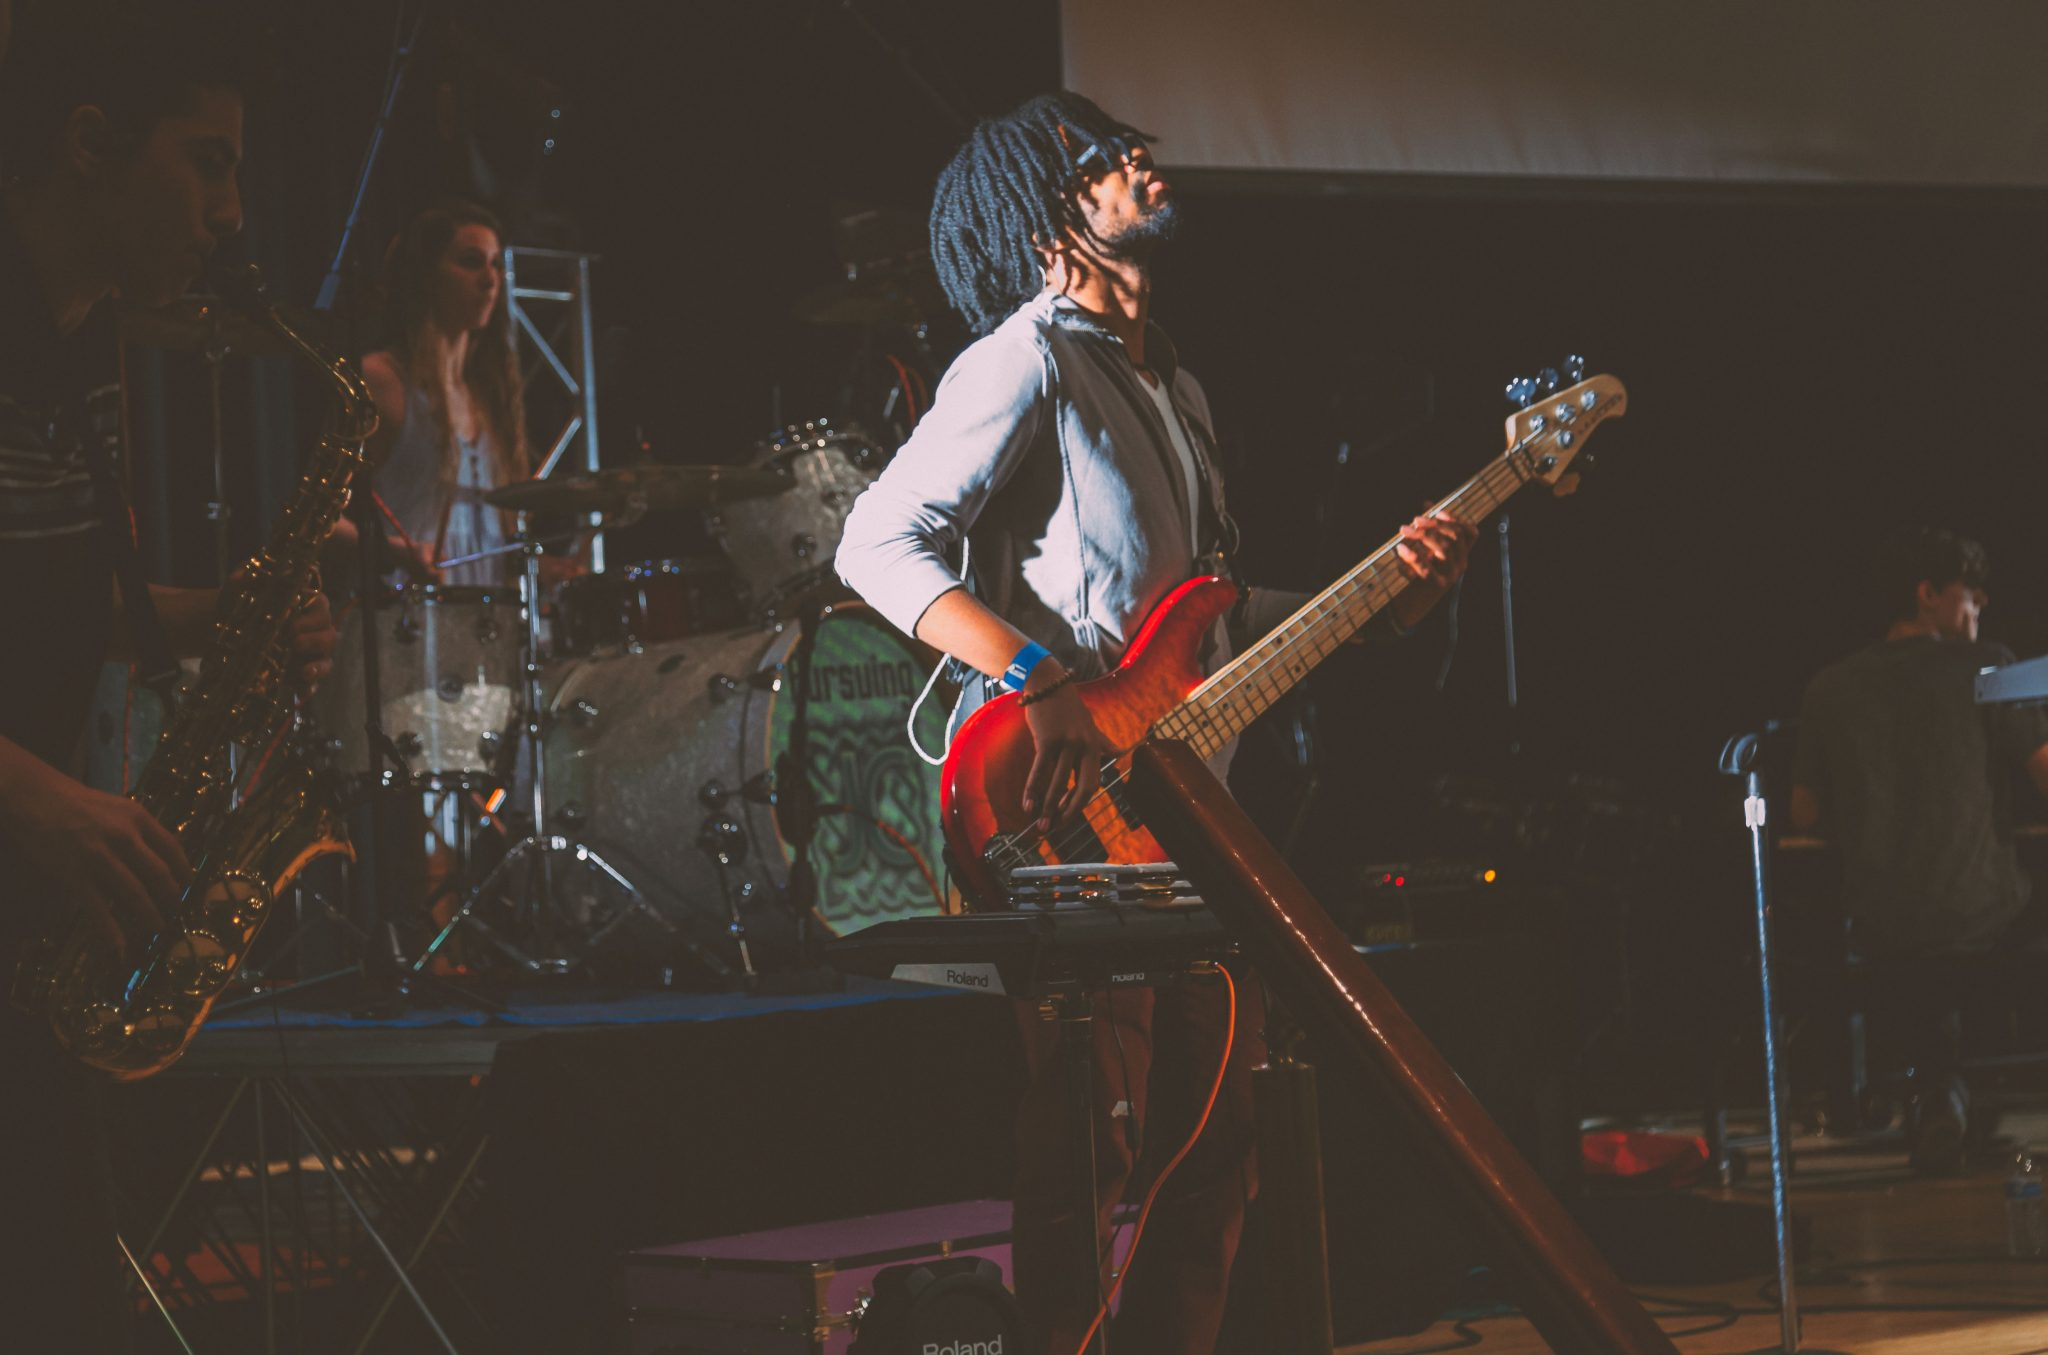 bassist performing live